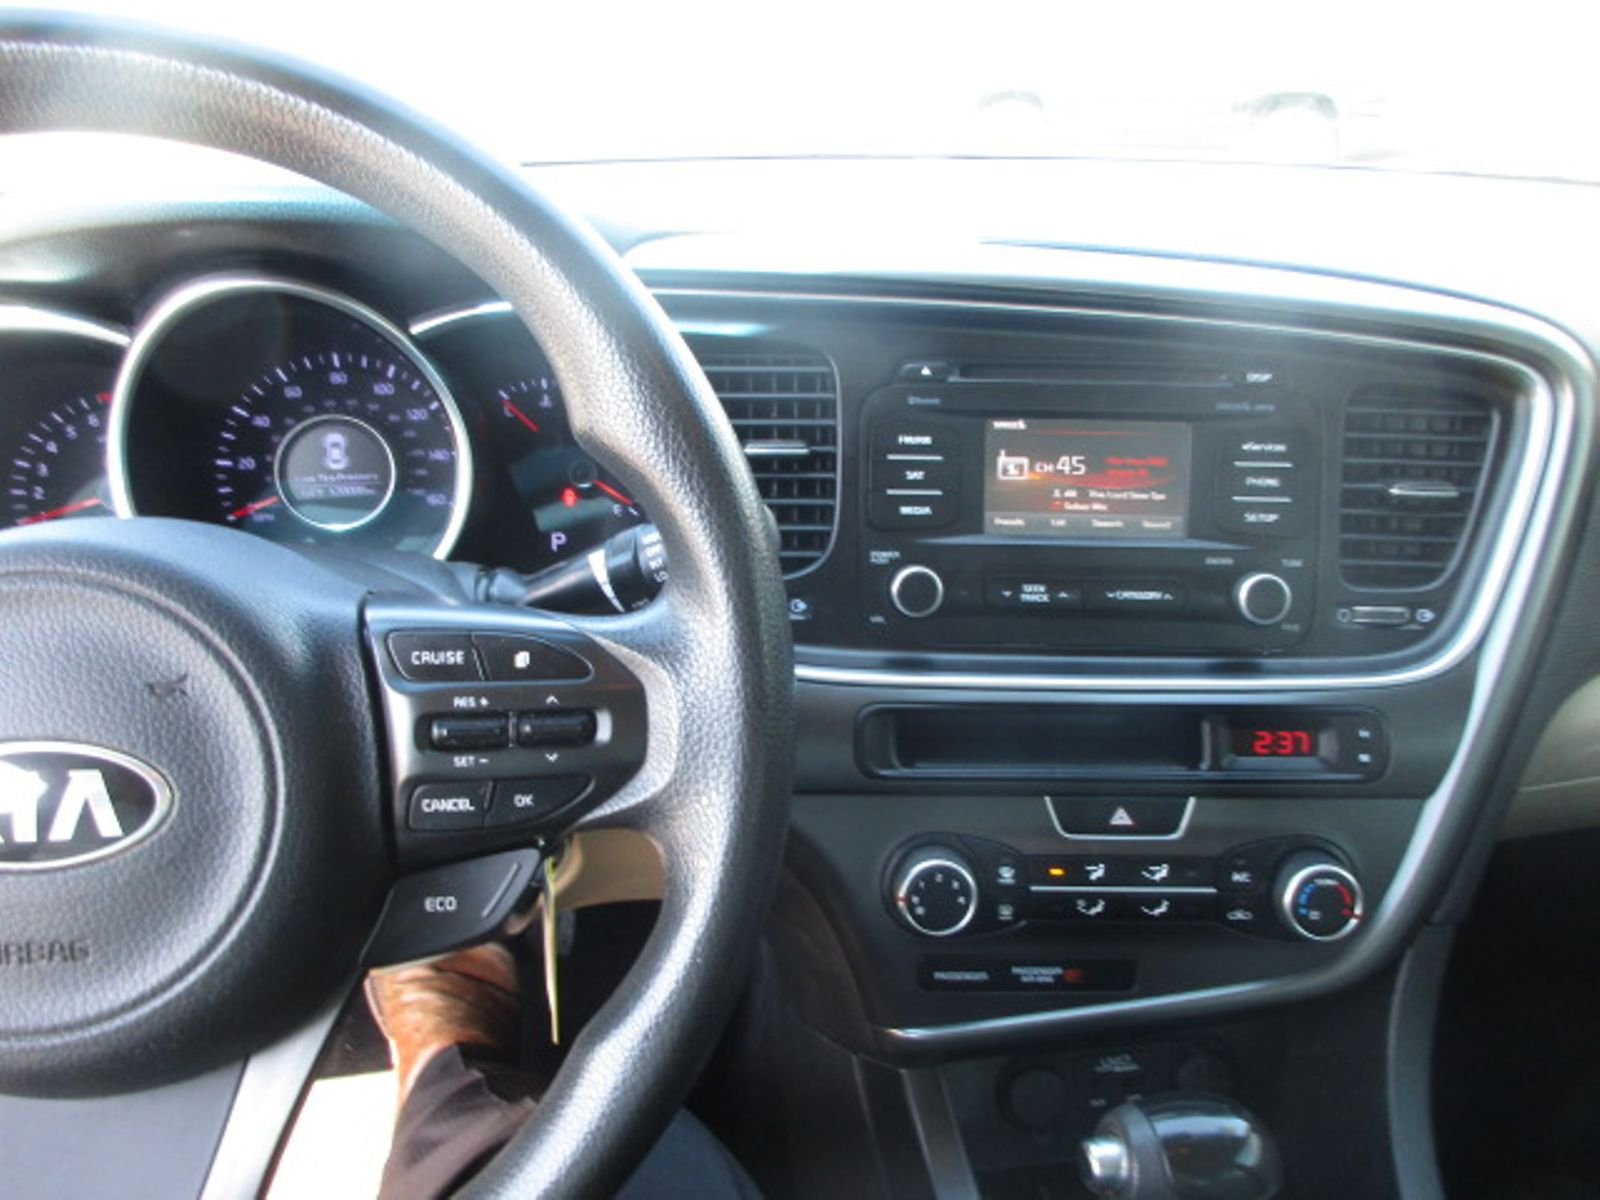 optima review gallery turbo news kia sx test road carcostcanada